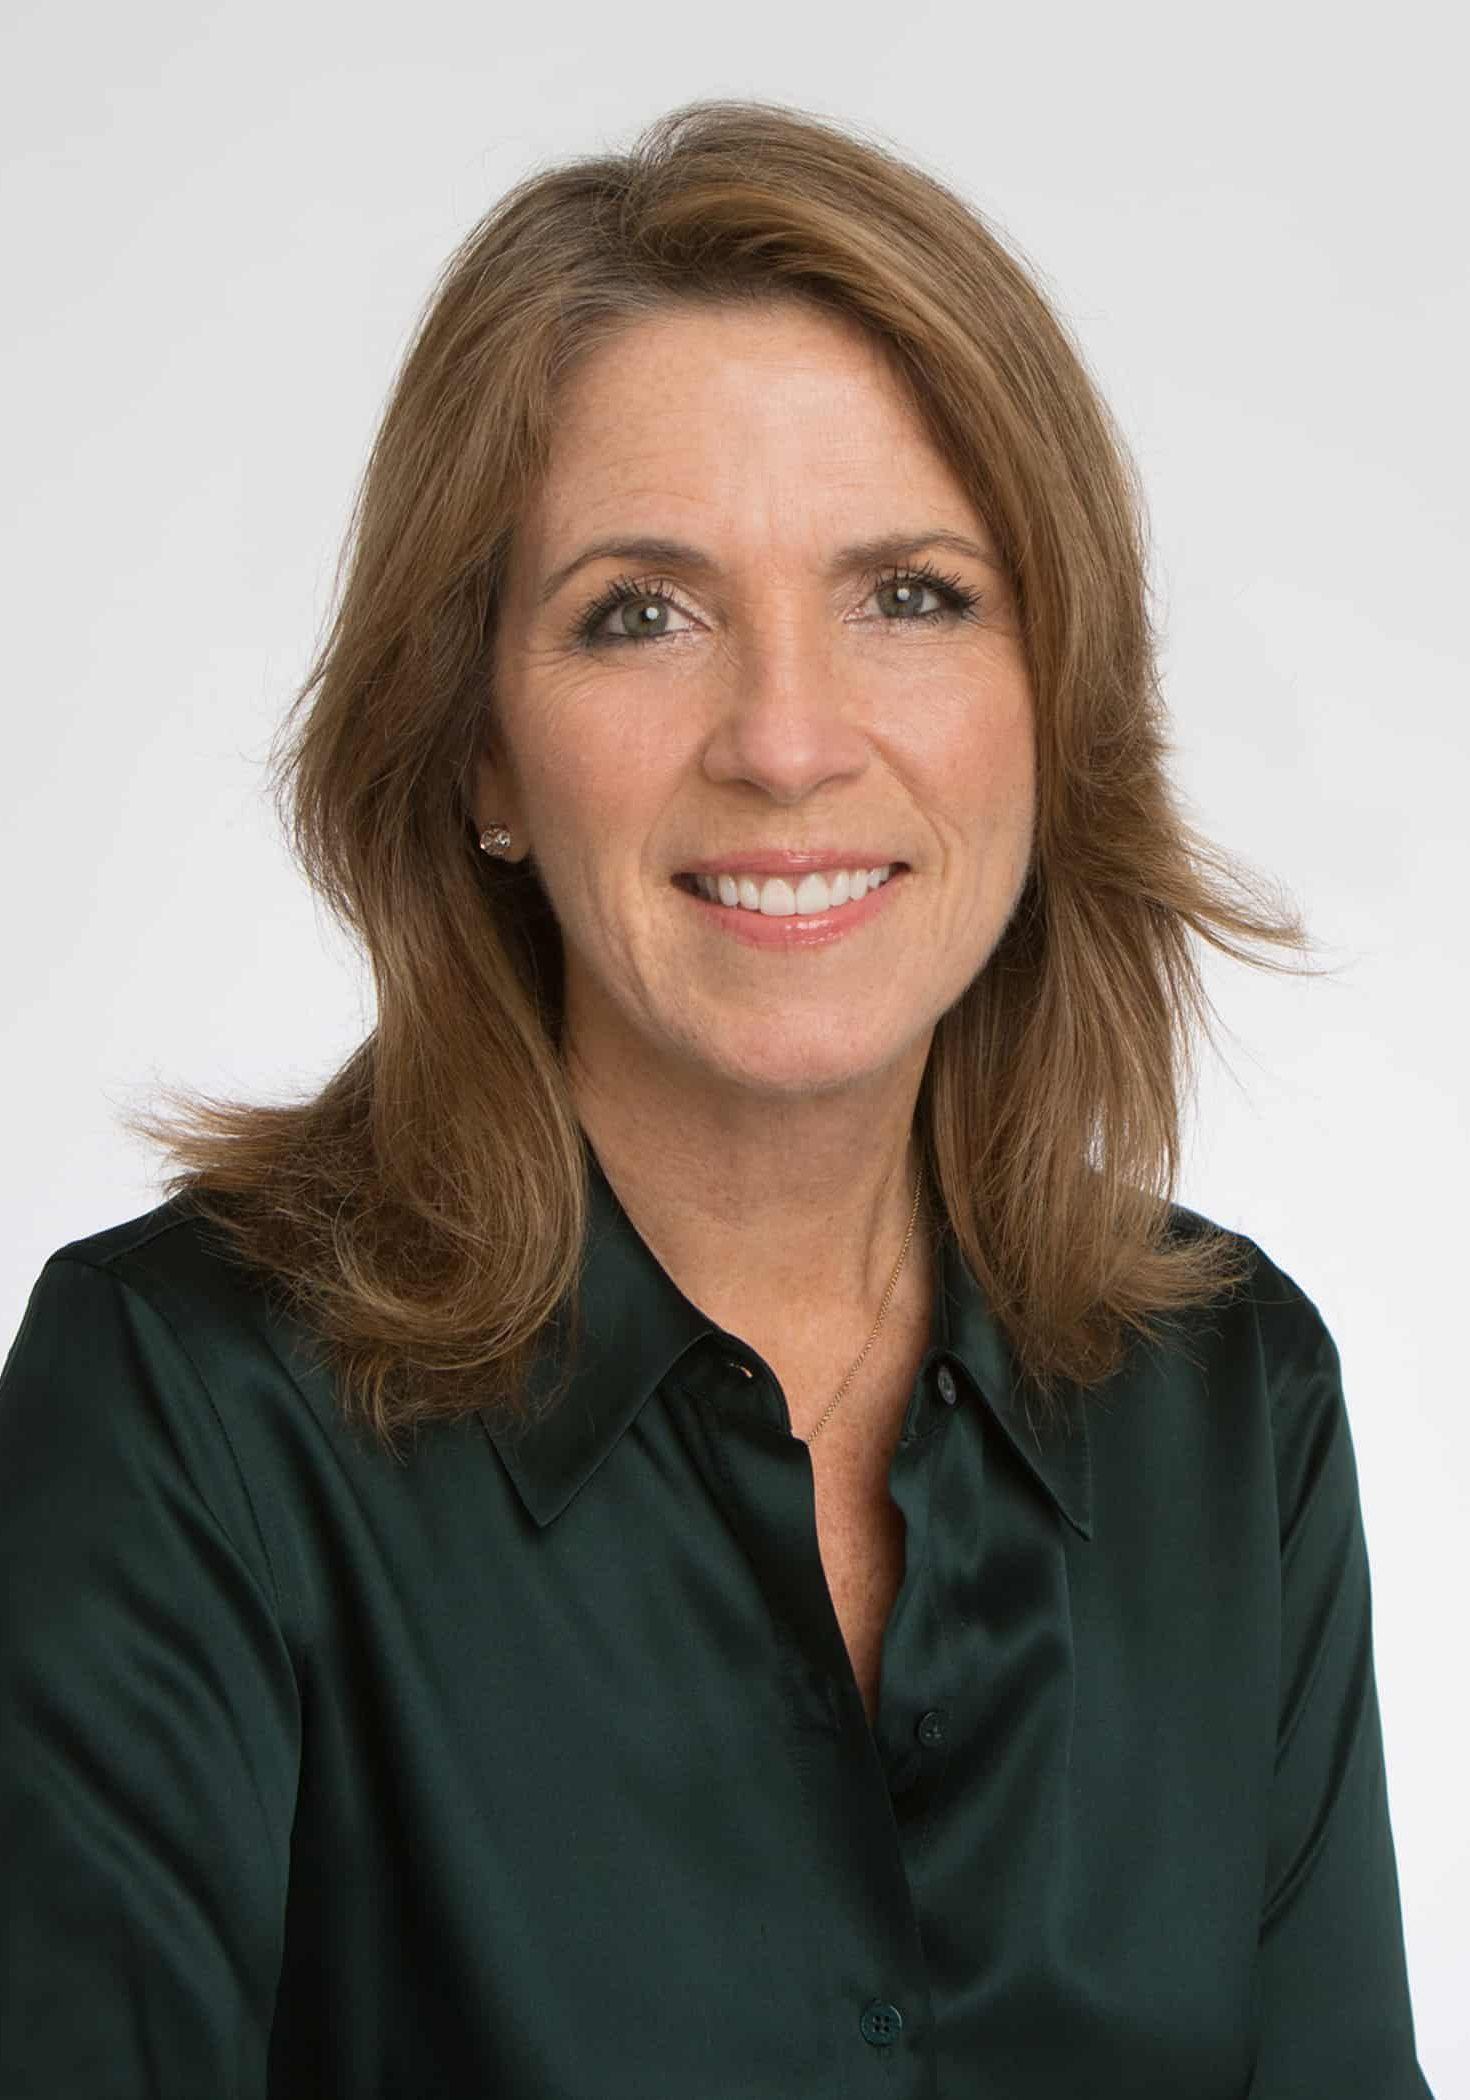 Headshot of CEO Jan